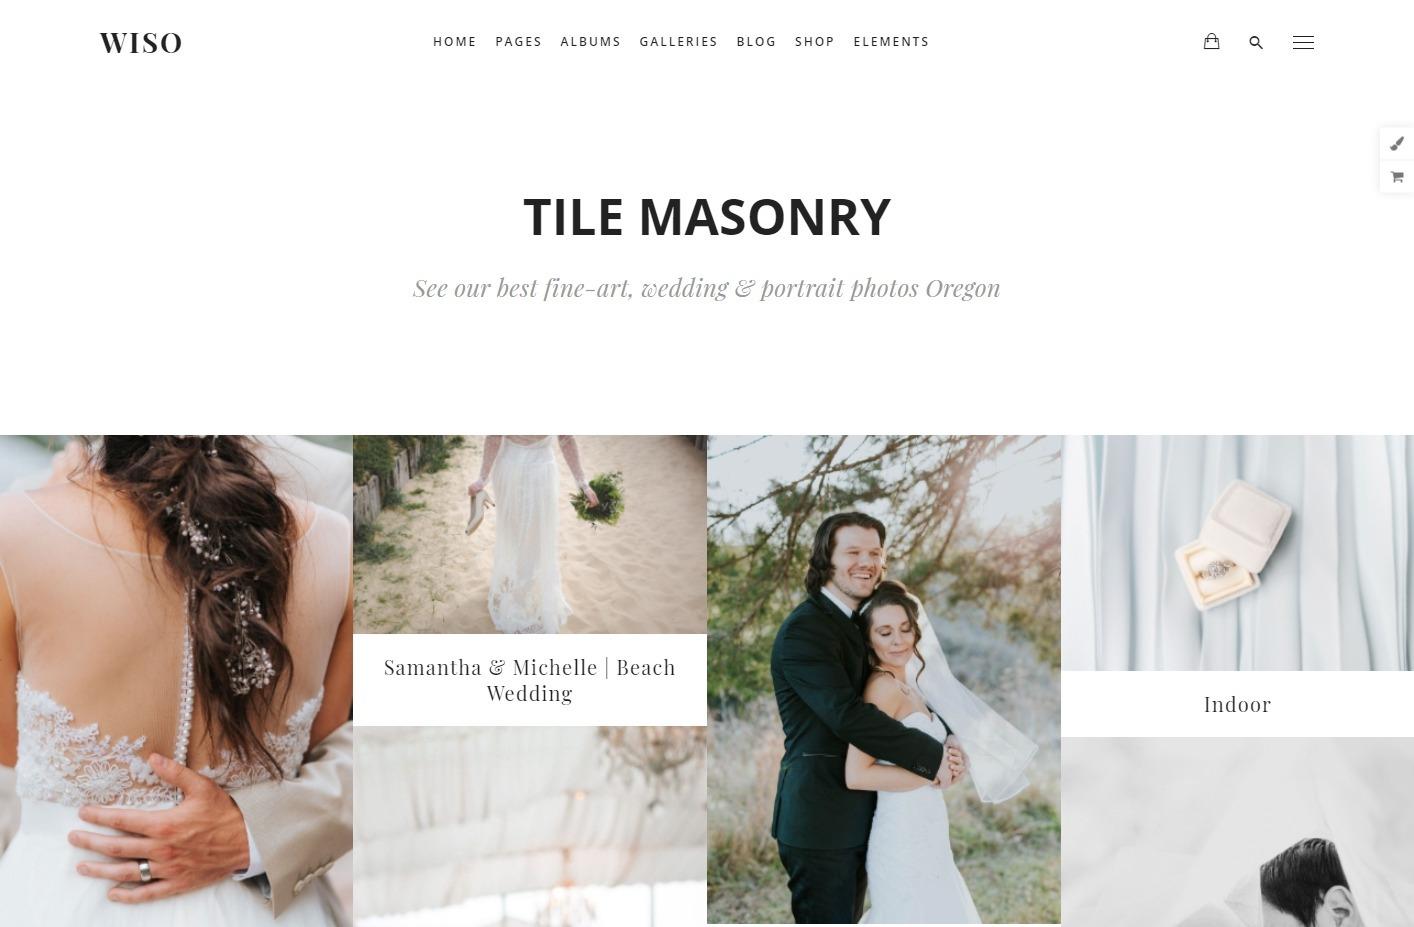 Wiso Masonry Grid Photo Album for Weddings